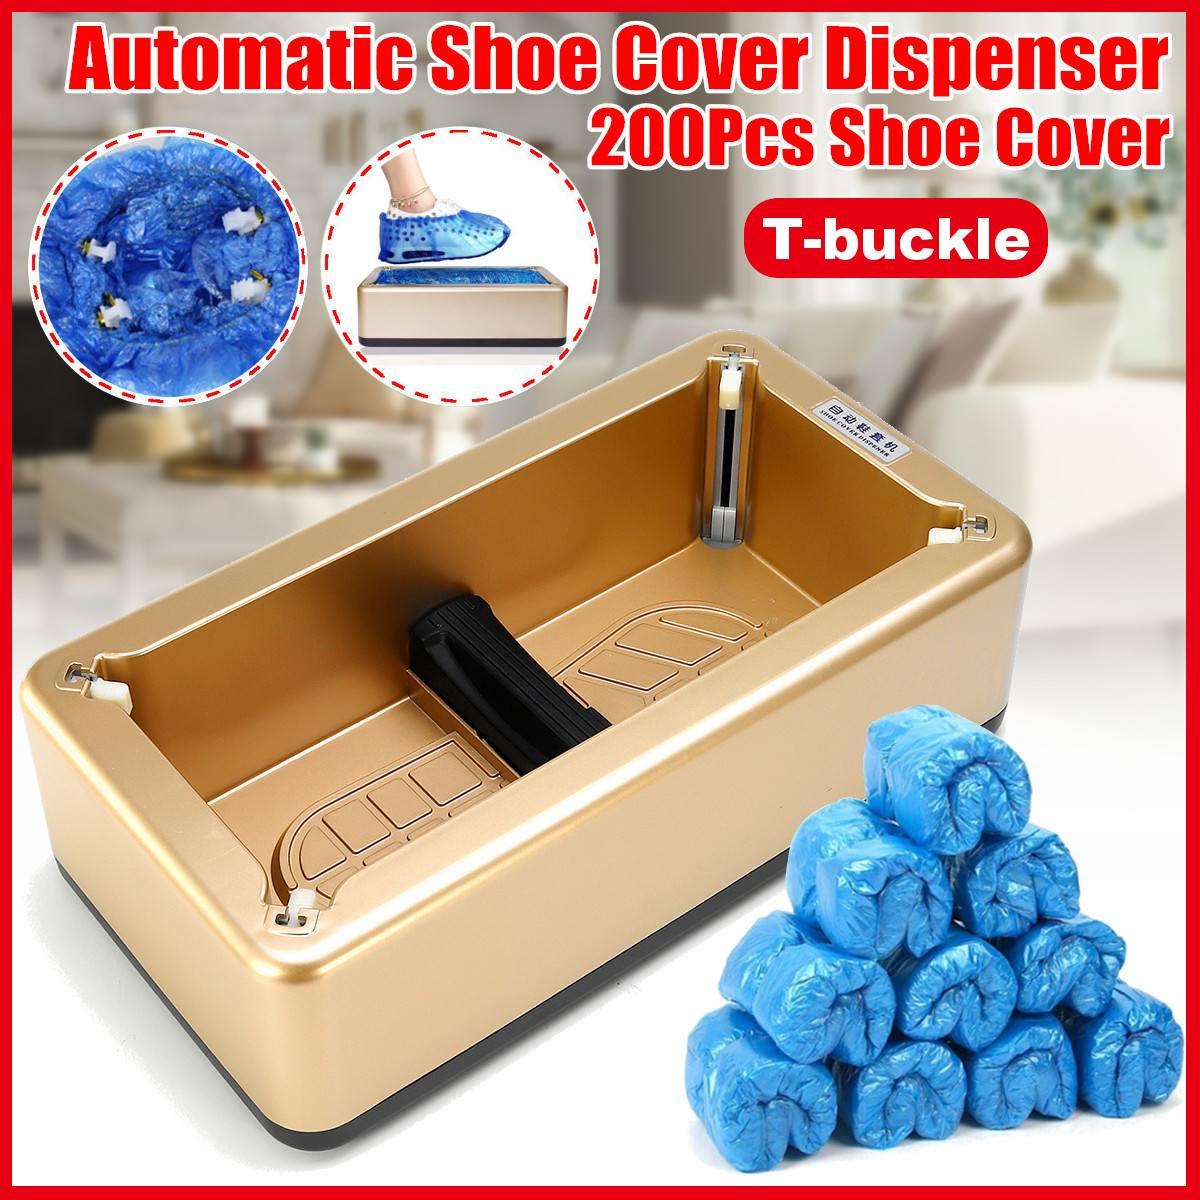 Automatic Shoe Cover Dispenser Machine Disposable Overshoe Dispenser Device With 100pcs PE Disposable Shoe Covers